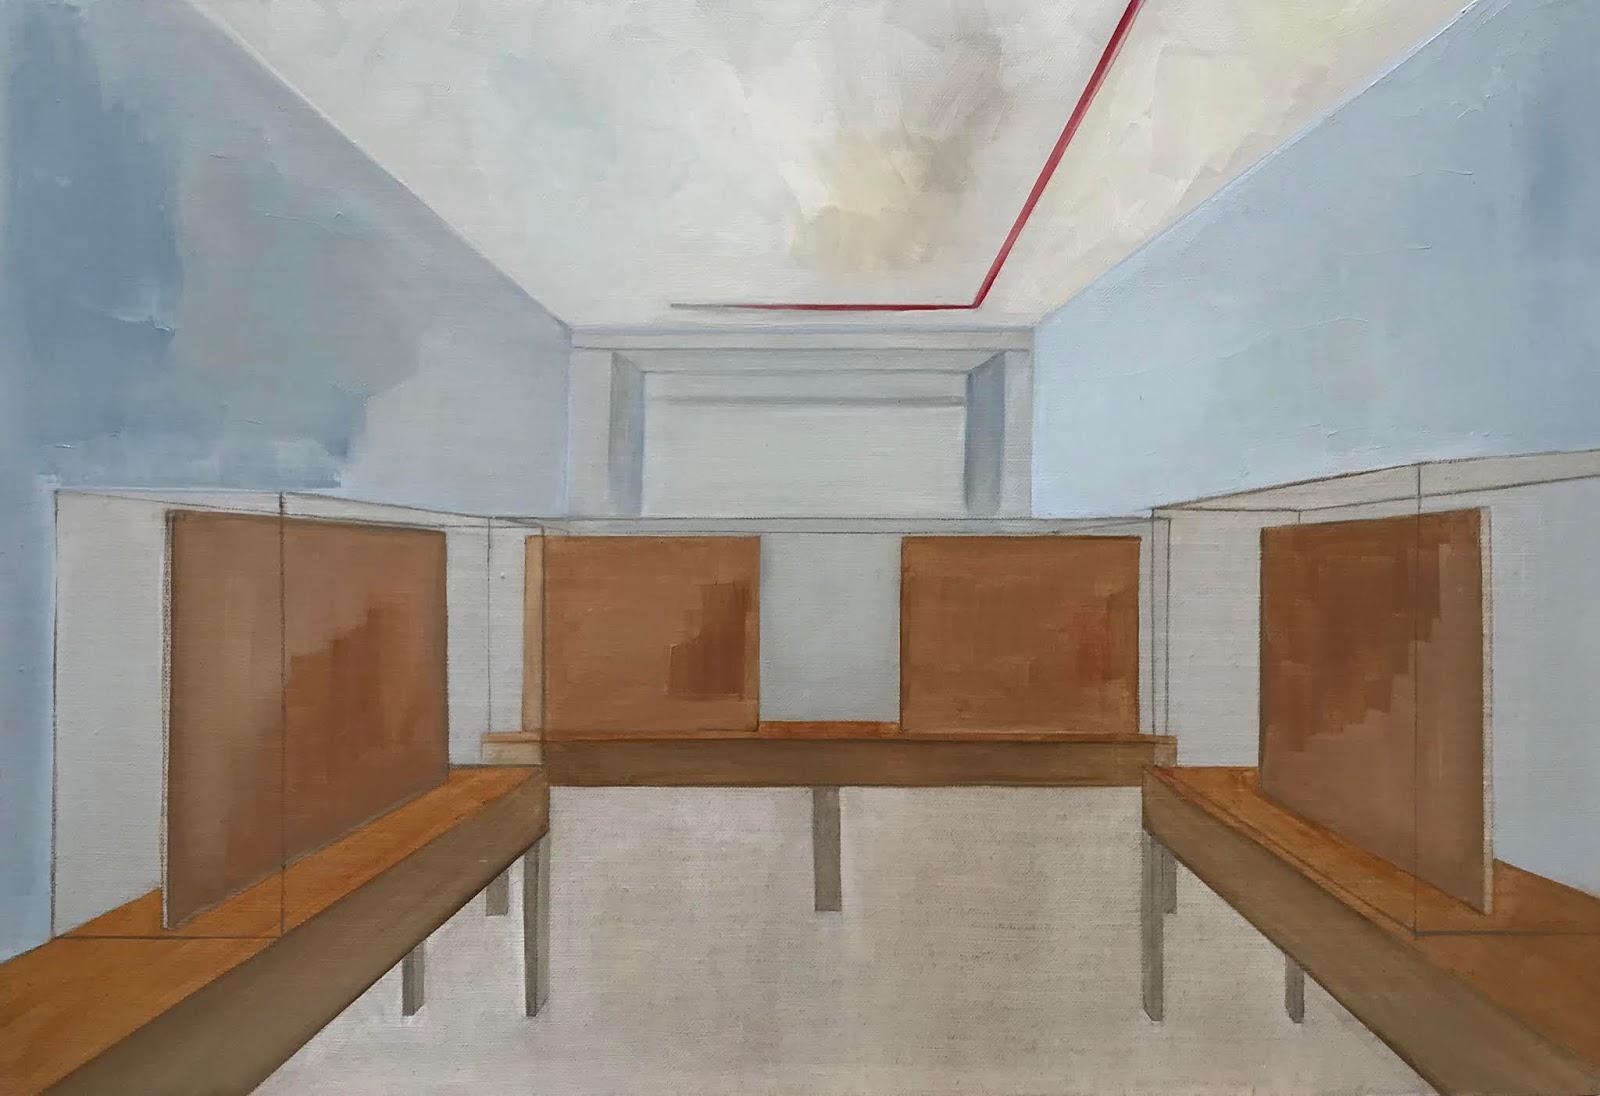 Tess Tanie, huile sur toile, 50 x 73 cm